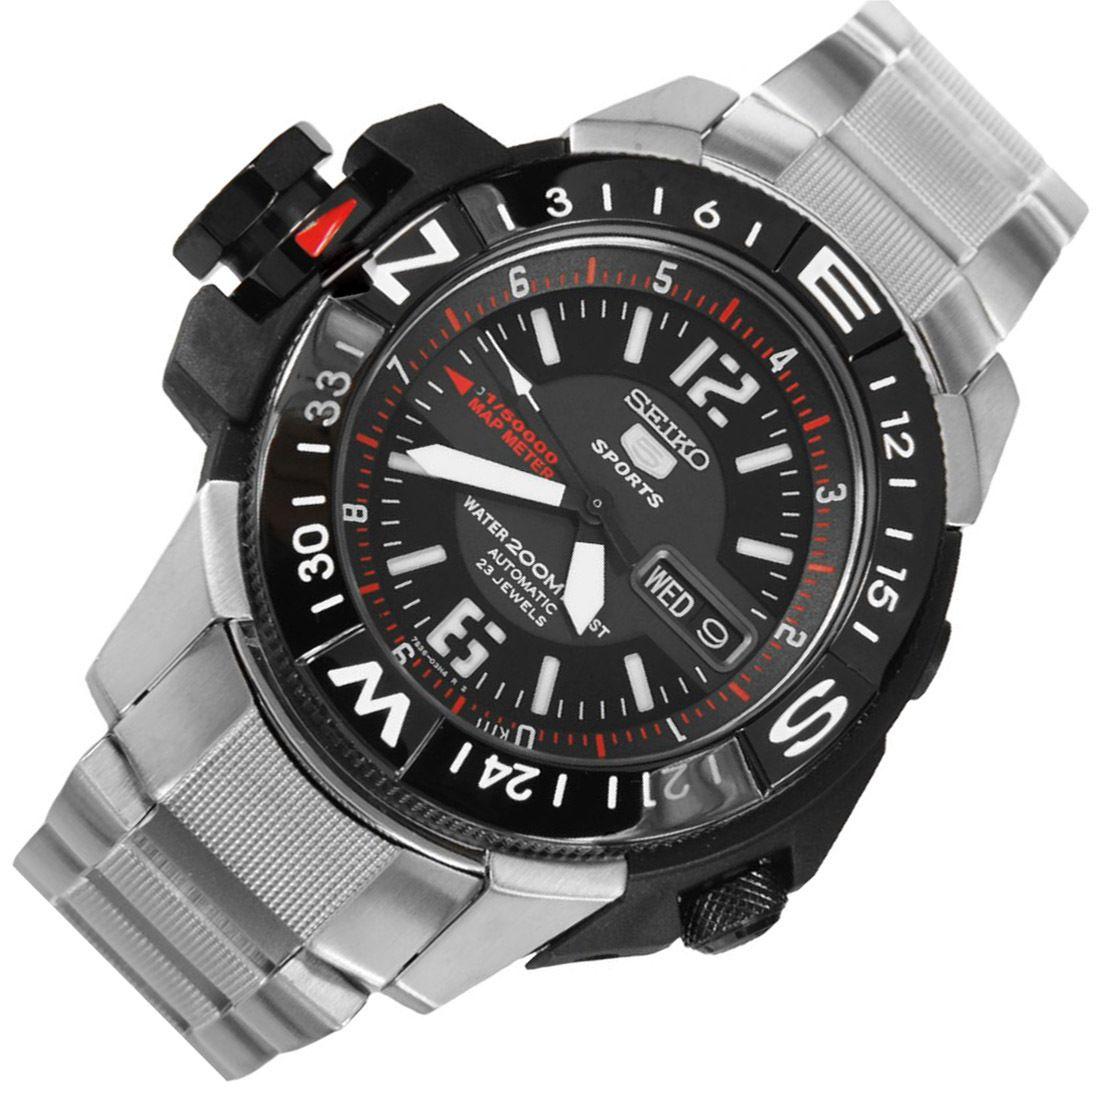 Seiko Automatic Map Meter Watch Skz229k1 Skz229k Skz229 In 2018 Bulova 90271 Jam Tangan Pria Silver A Watchescom 22800